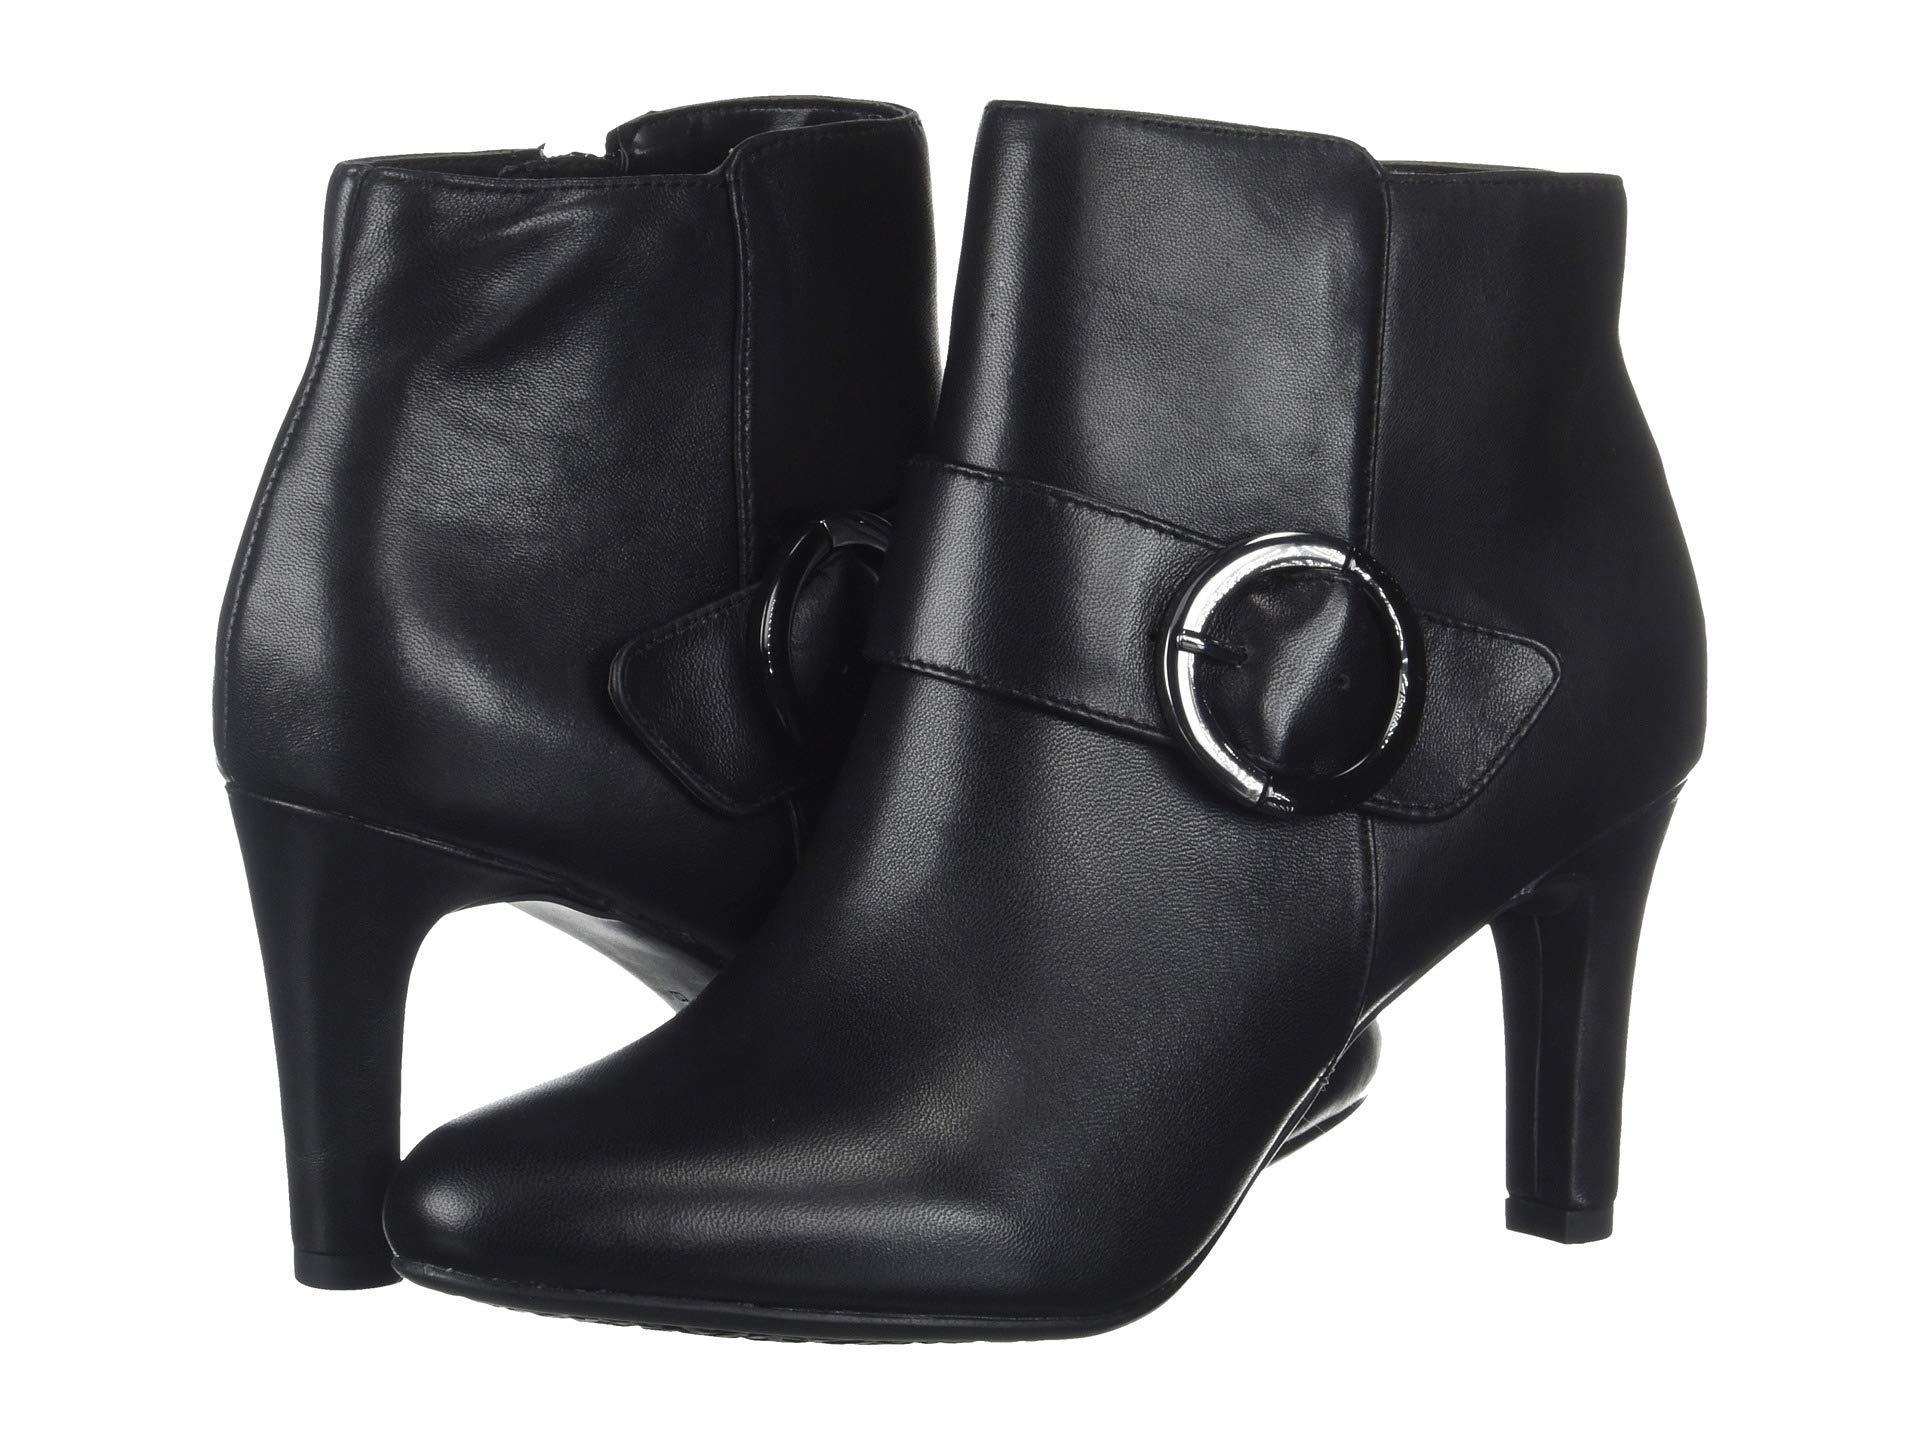 a79deebea0f1 Lyst - Bandolino Lanaro Ankle Boot in Black - Save 50%